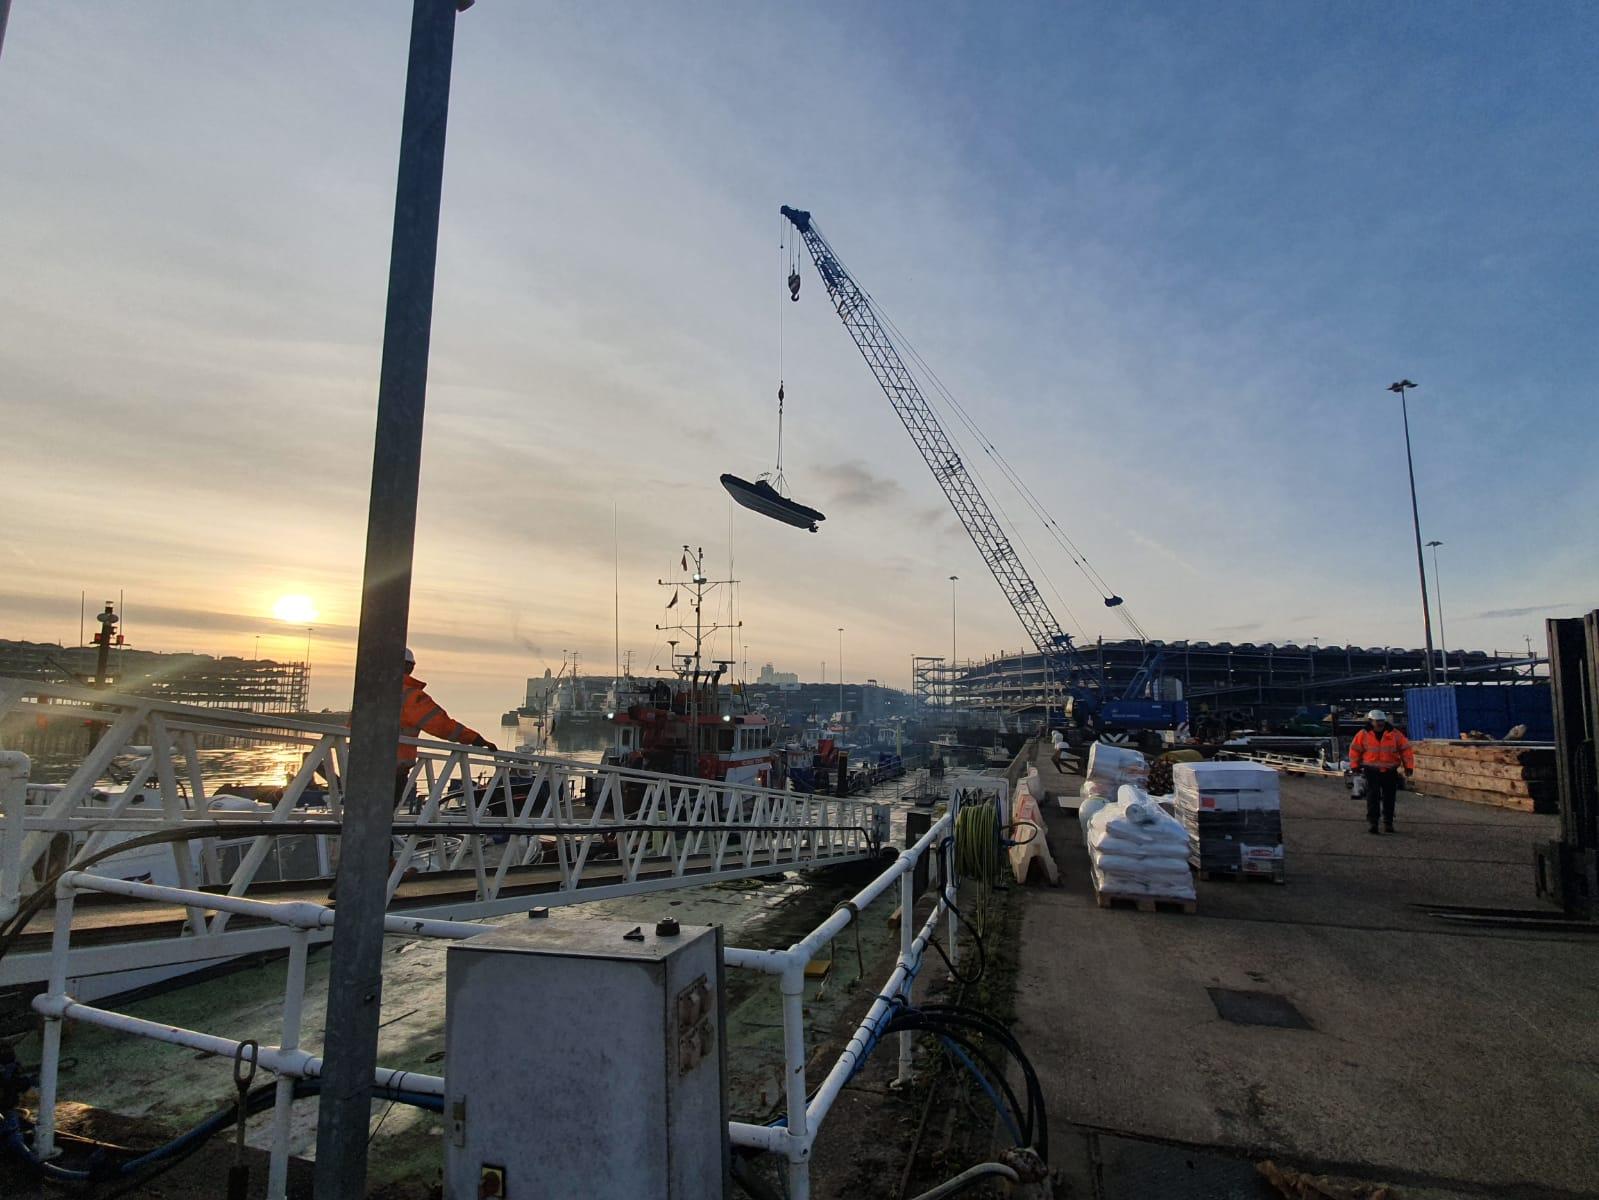 Single point lift Williams Shipping Island 7.5m